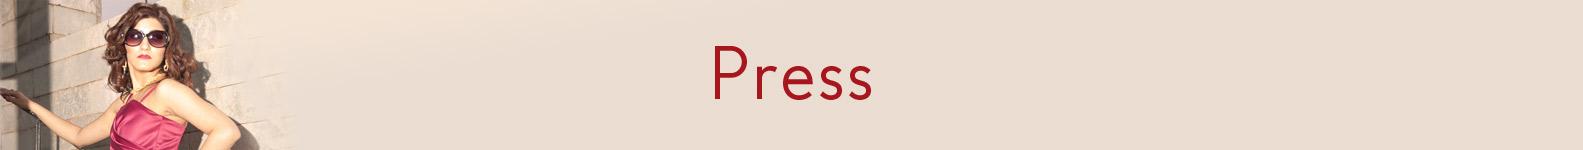 press-fashion-blog-marketing-publicity-branding-interview-indian-blogger-shilpa-ahuja